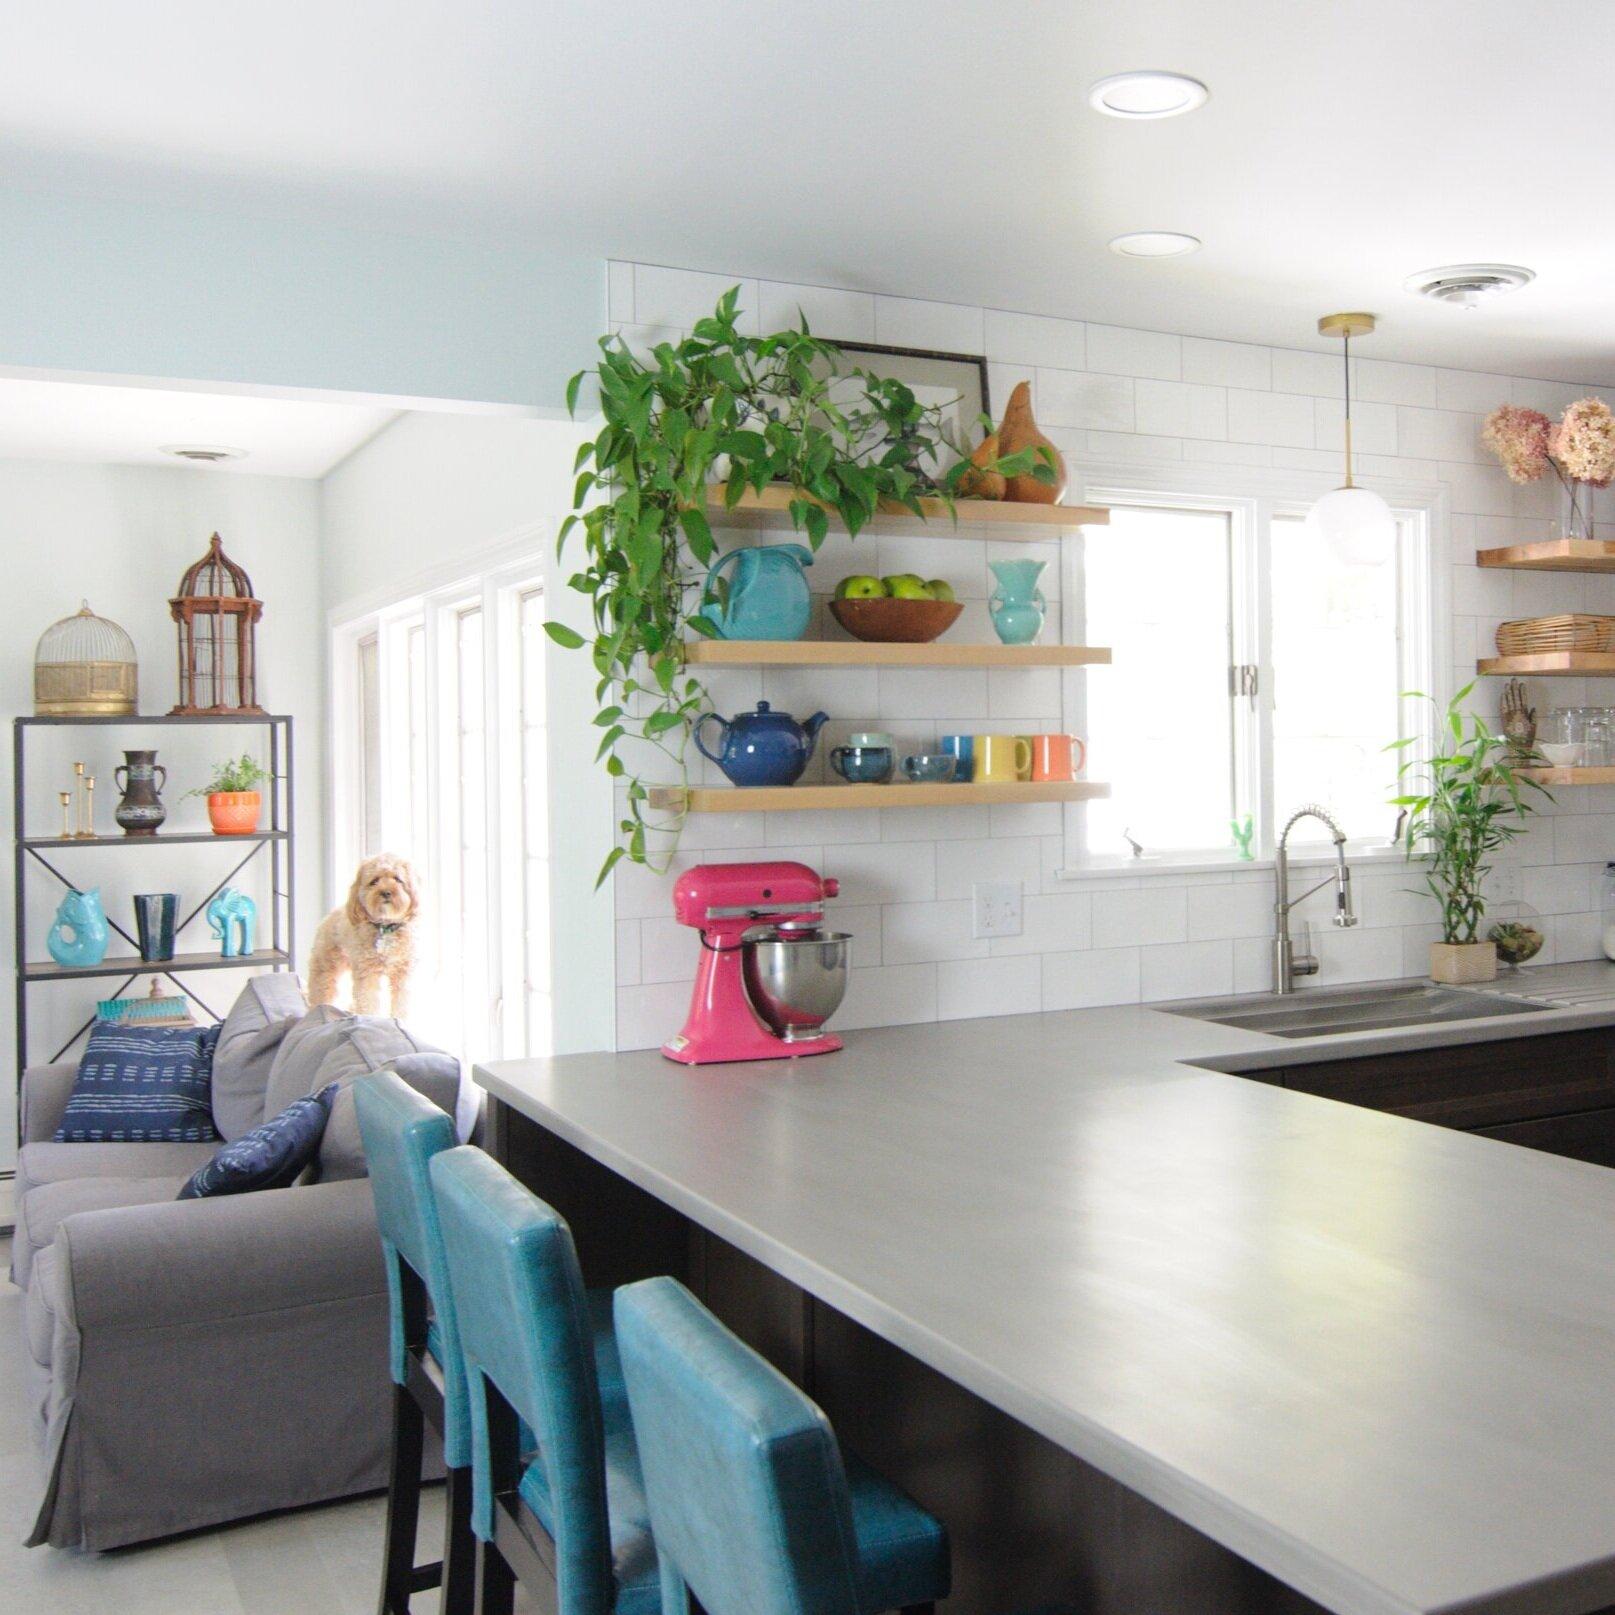 Sunrise Avenue - Kitchen Remodel